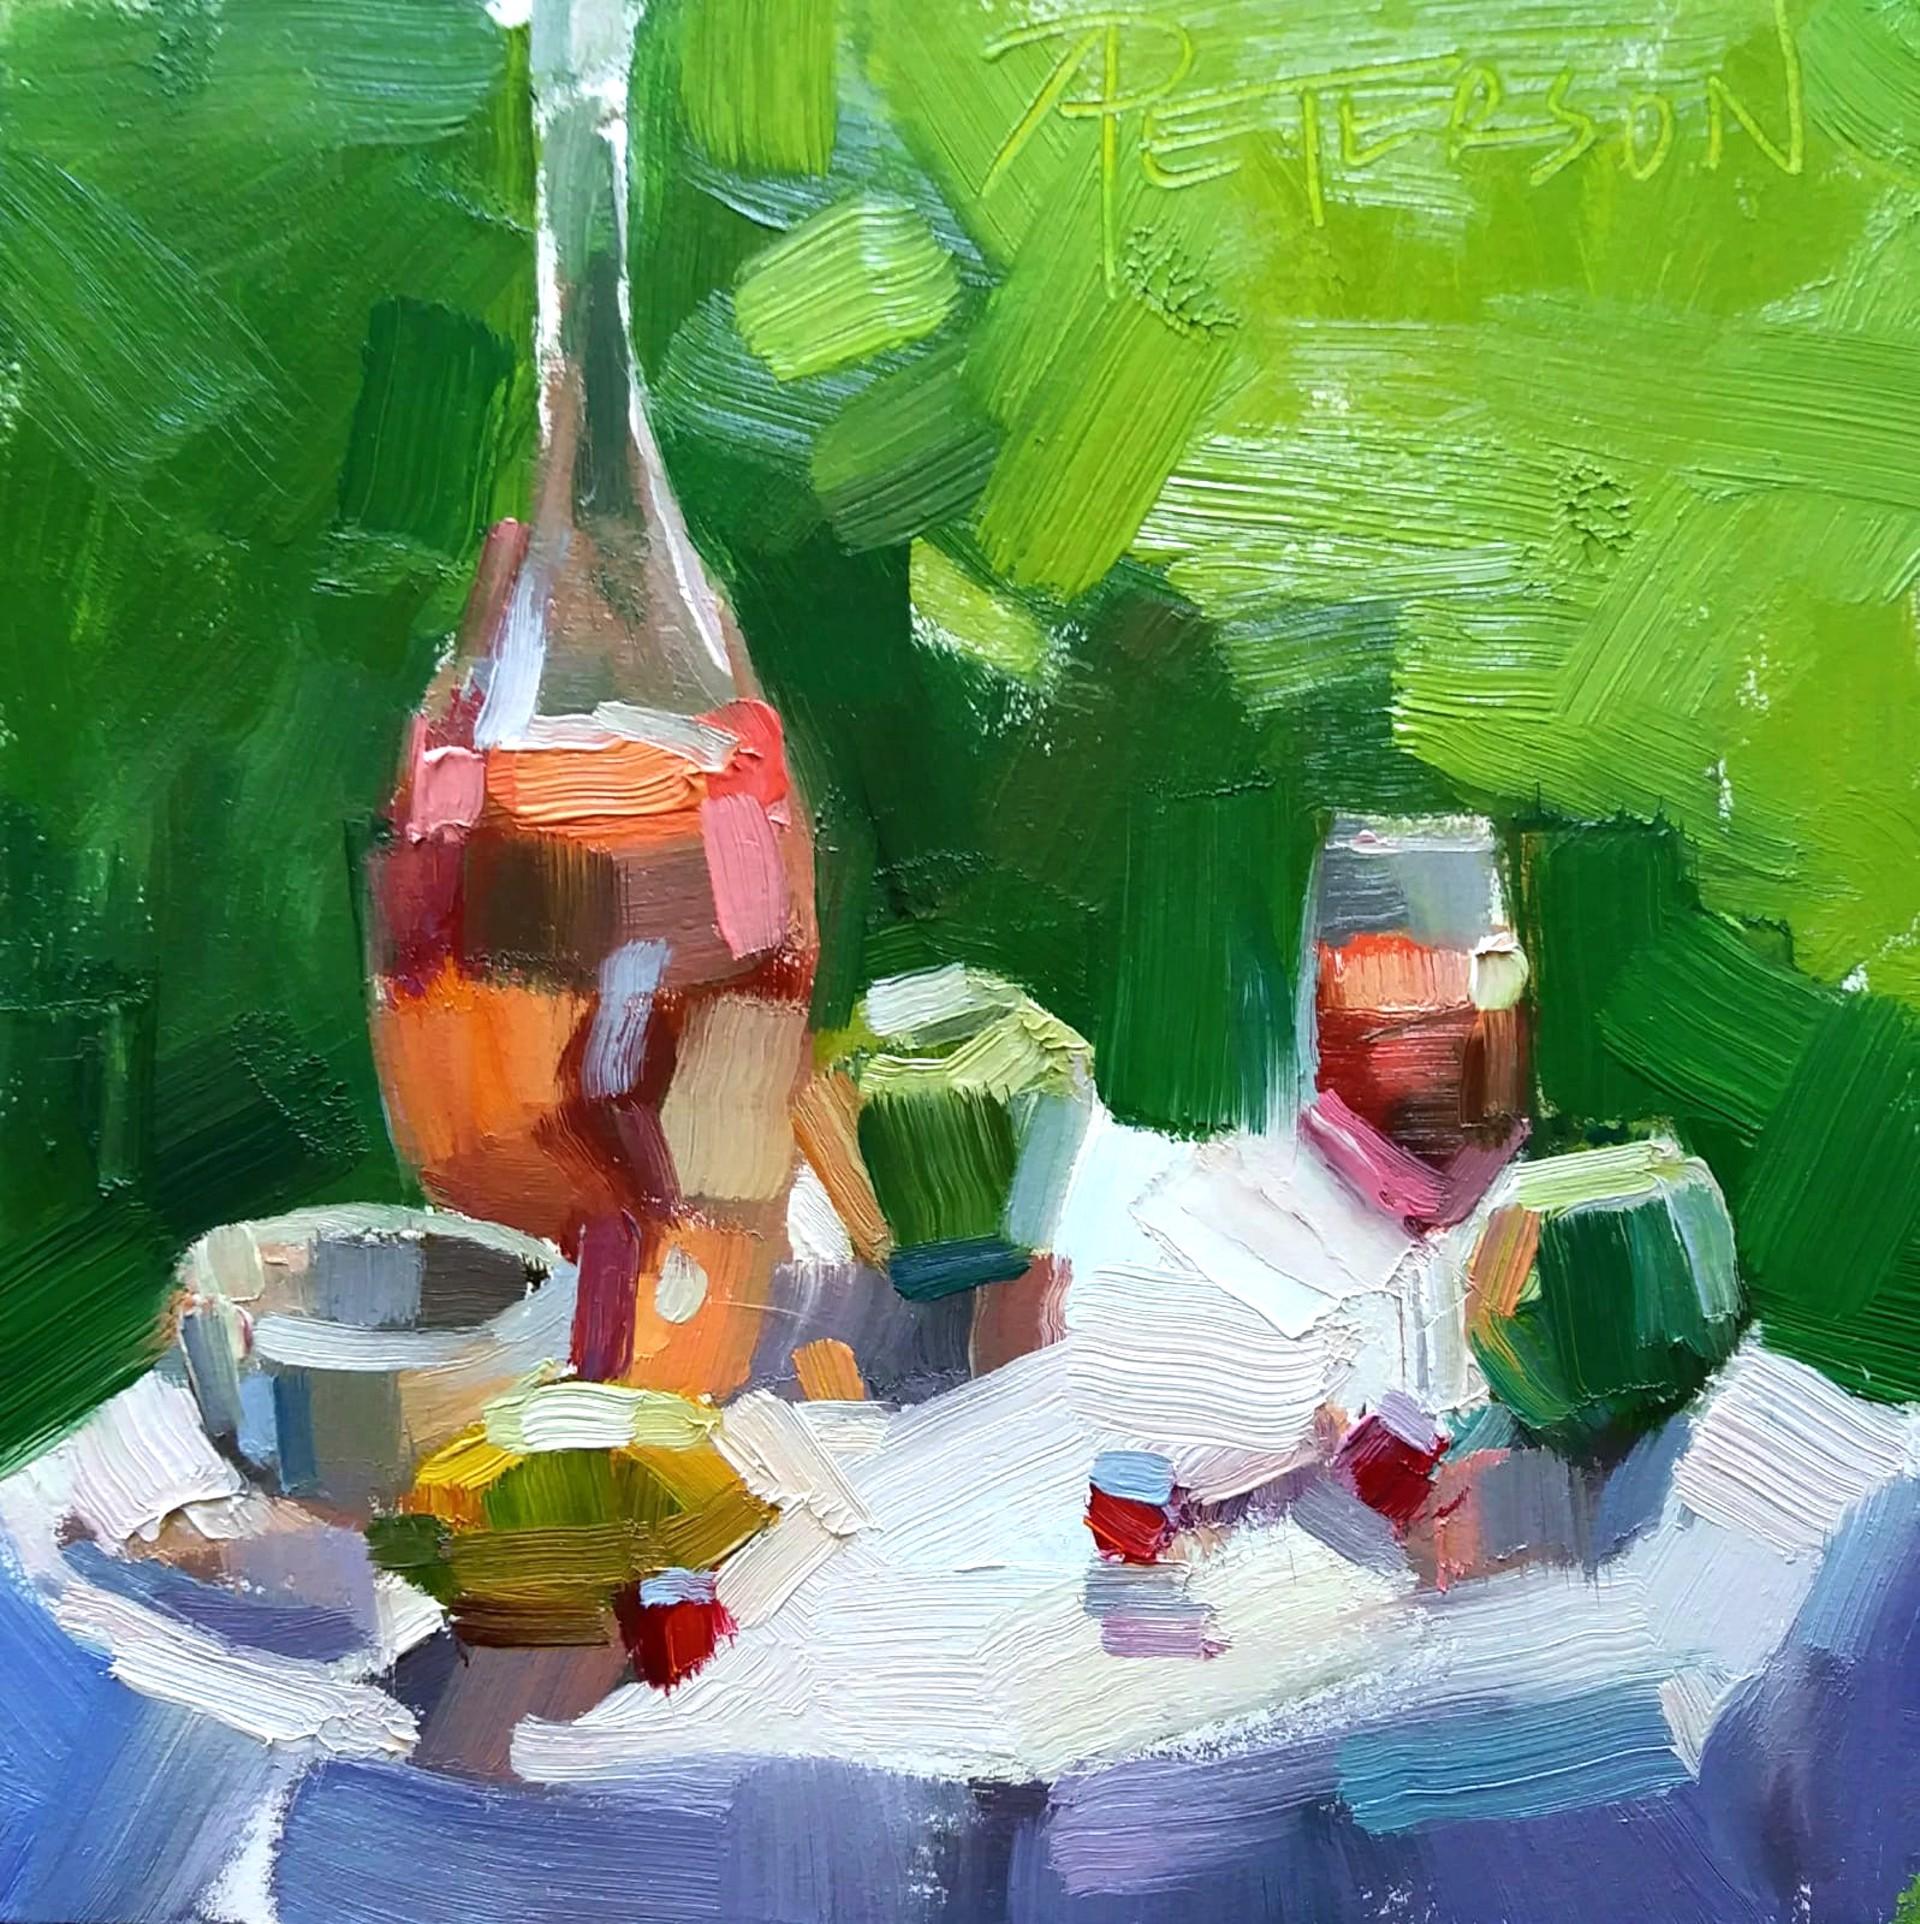 Al Fresco by Amy R. Peterson